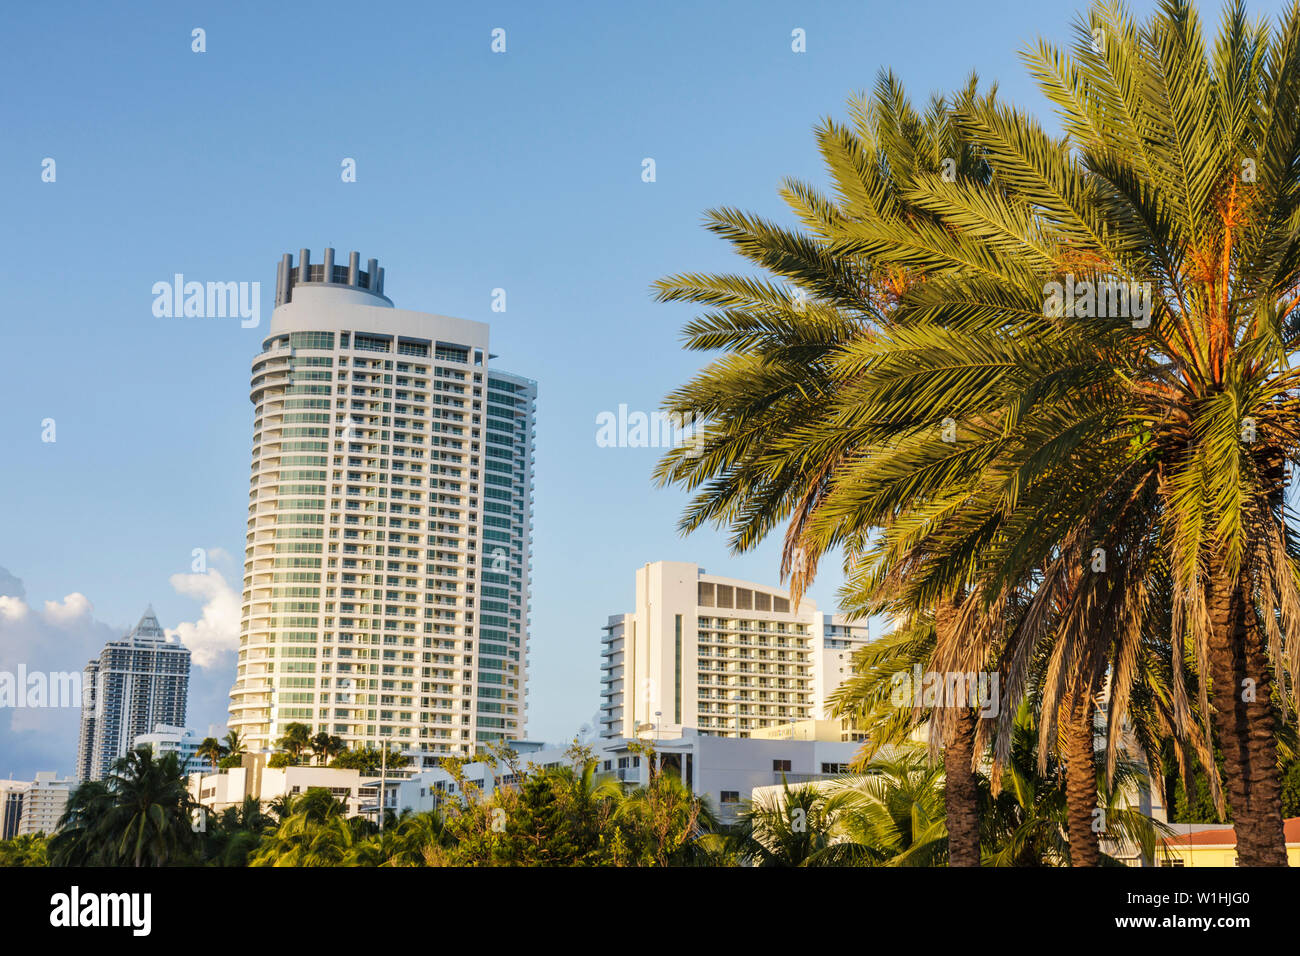 Miami Beach Florida Collins Avenue skyline Fontainebleau II luxury condo hotel resort oceanfront real estate high-rise skyscra - Stock Image